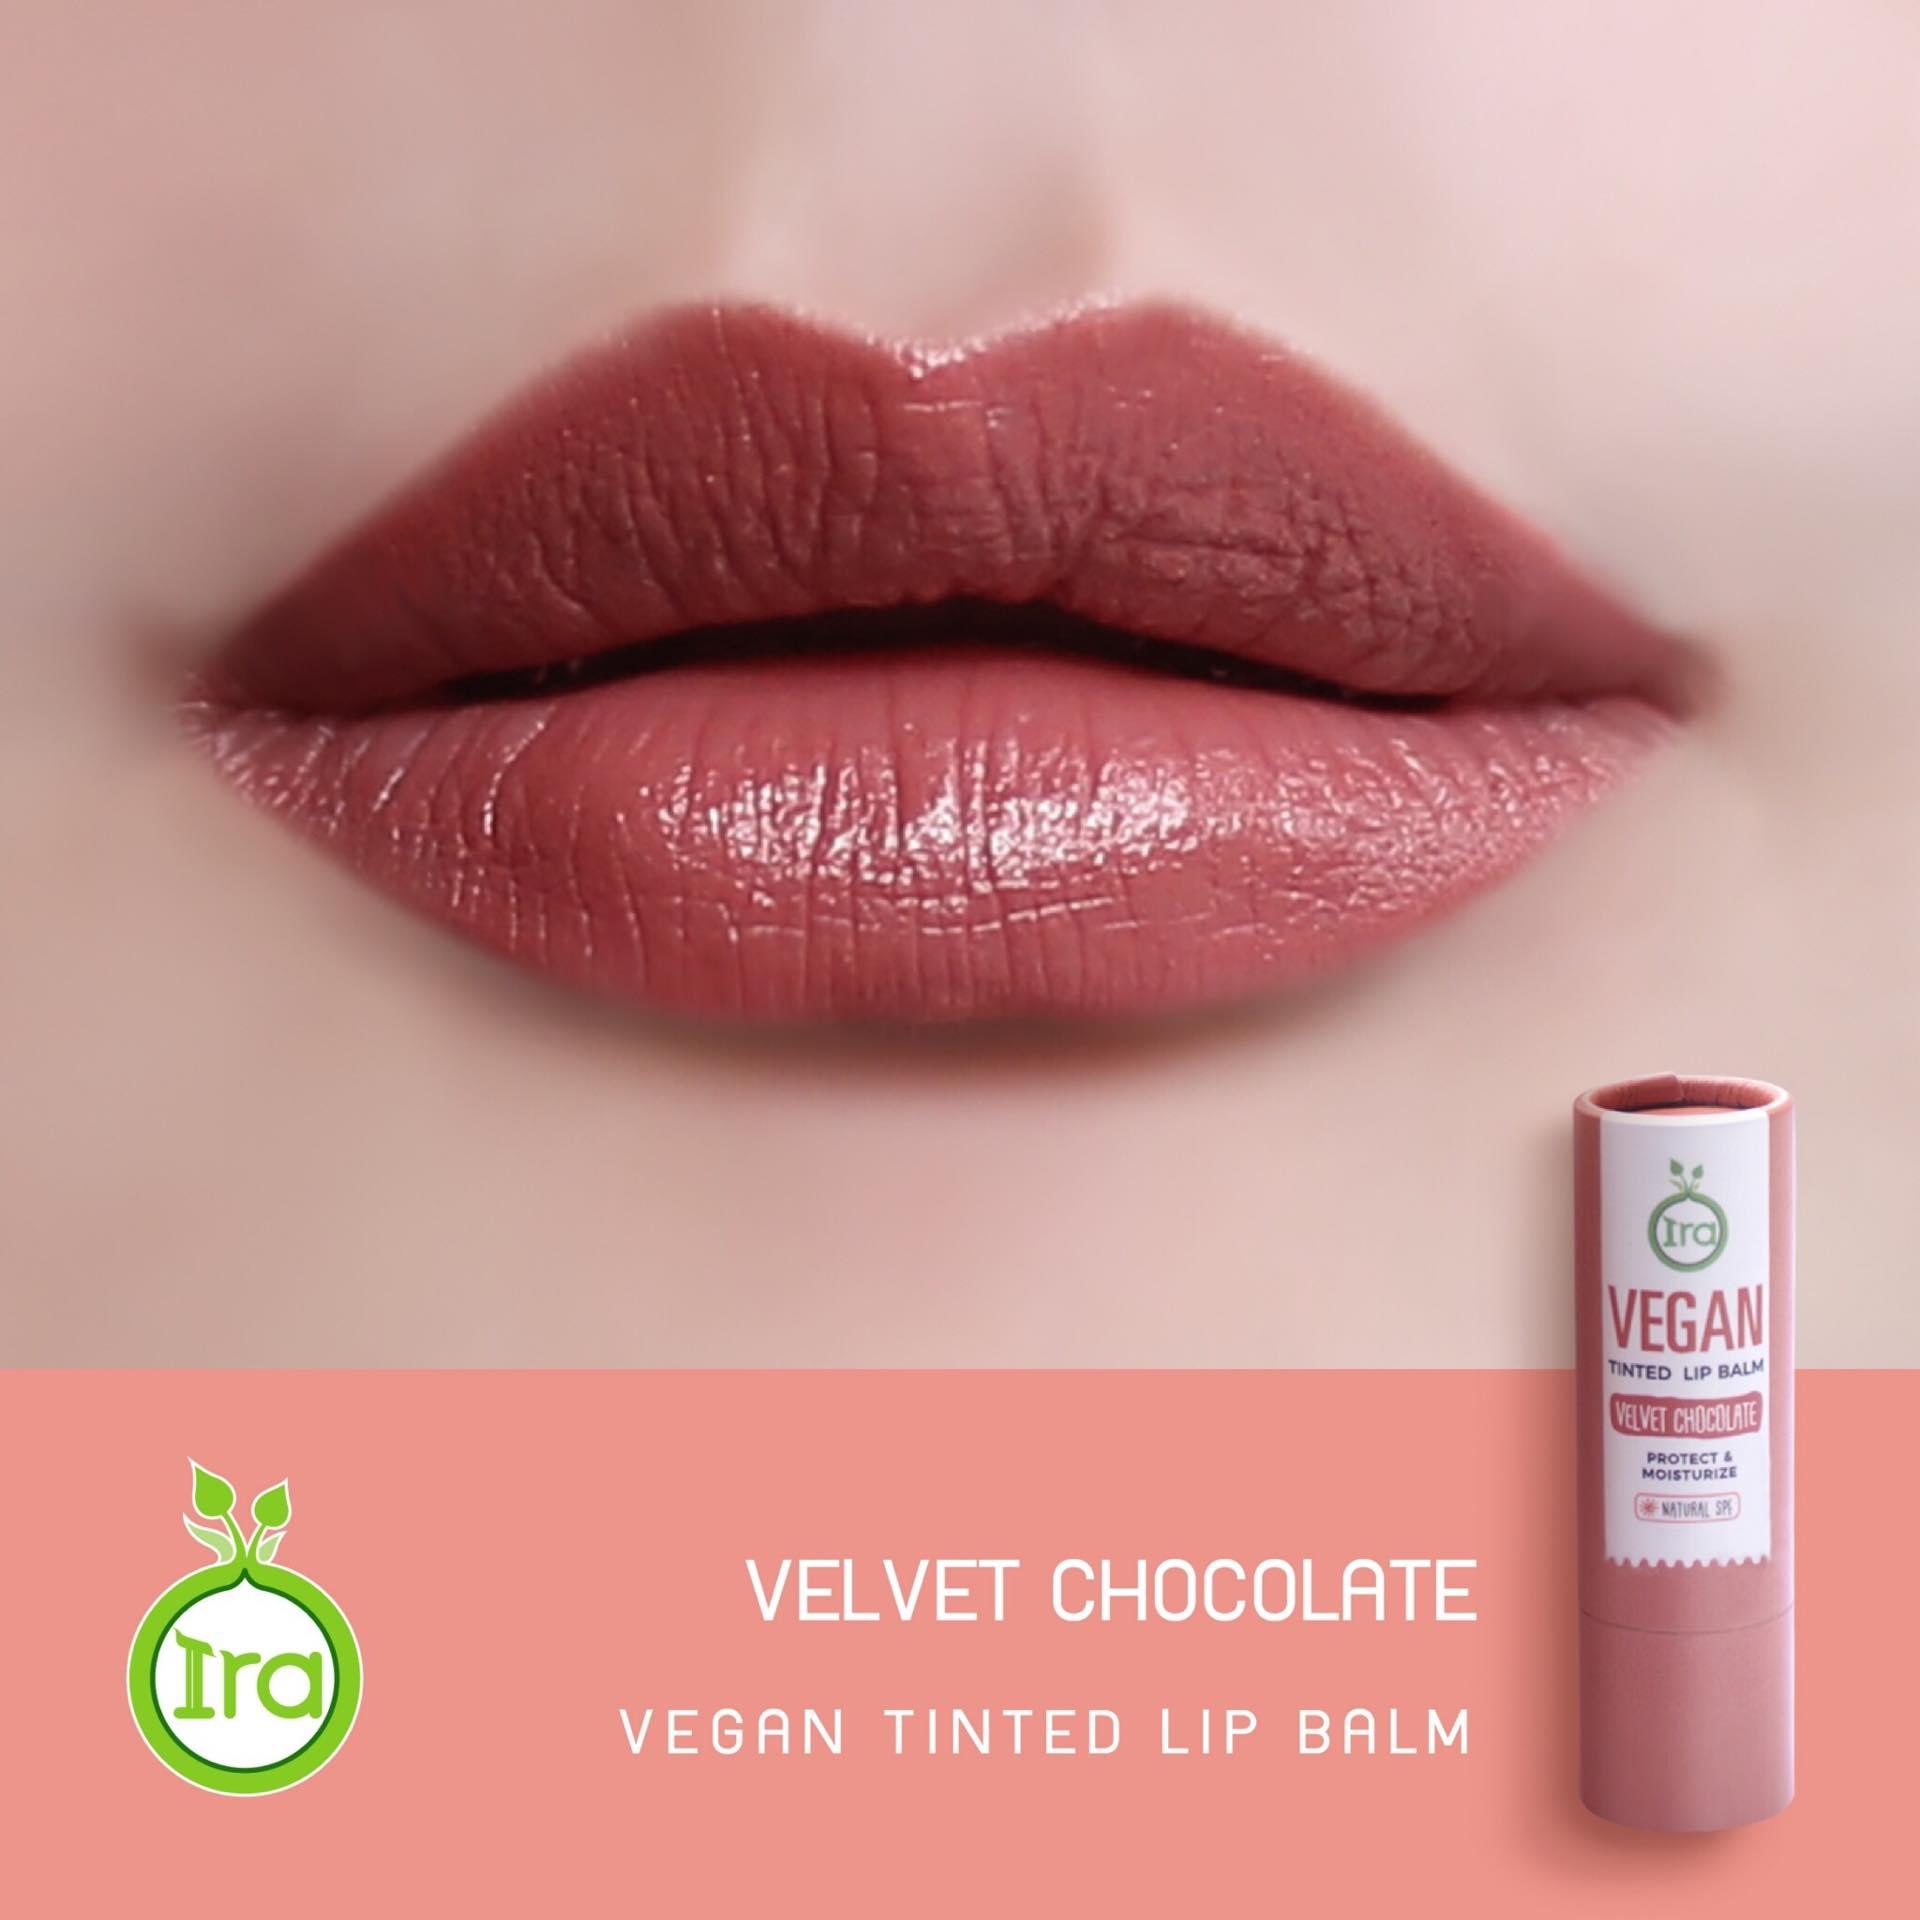 Vegan Tinted Lip Balm: Velvet Chocolate